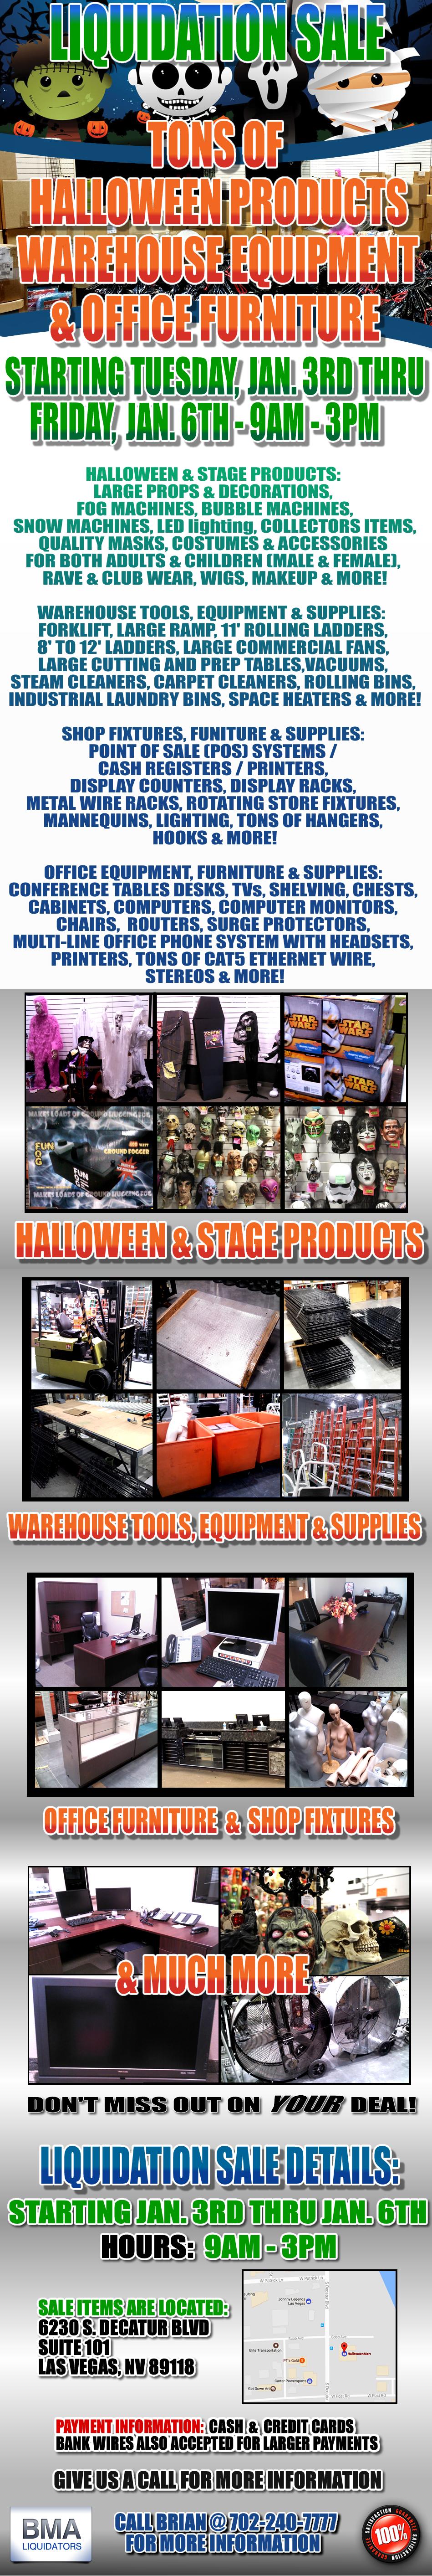 Bma Liquidators Giant Halloween Company Goes Out Of